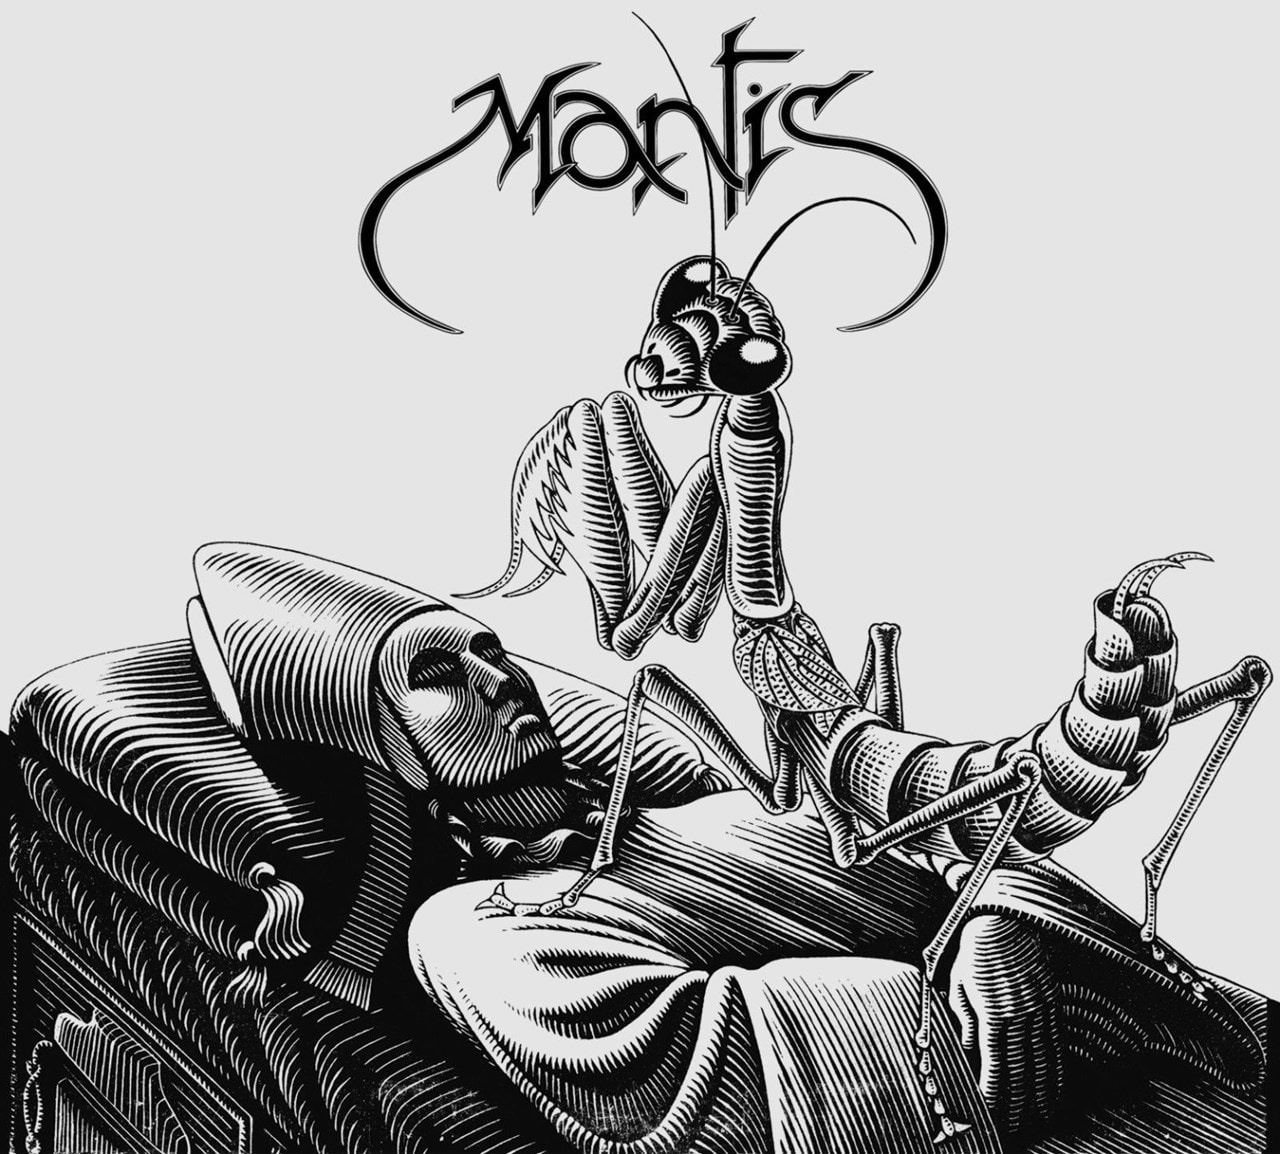 Mantis - 1